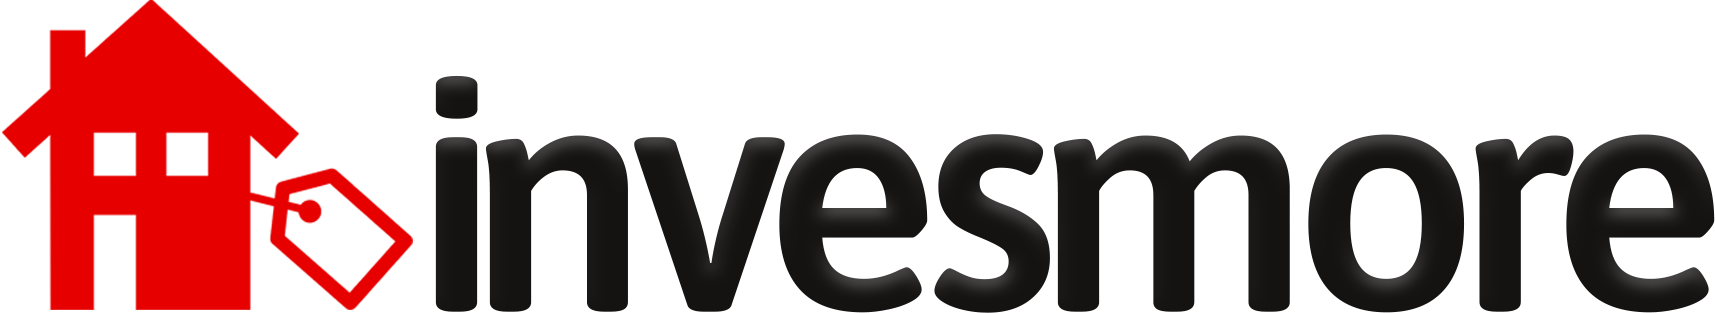 invesmore real estate logo 1-3